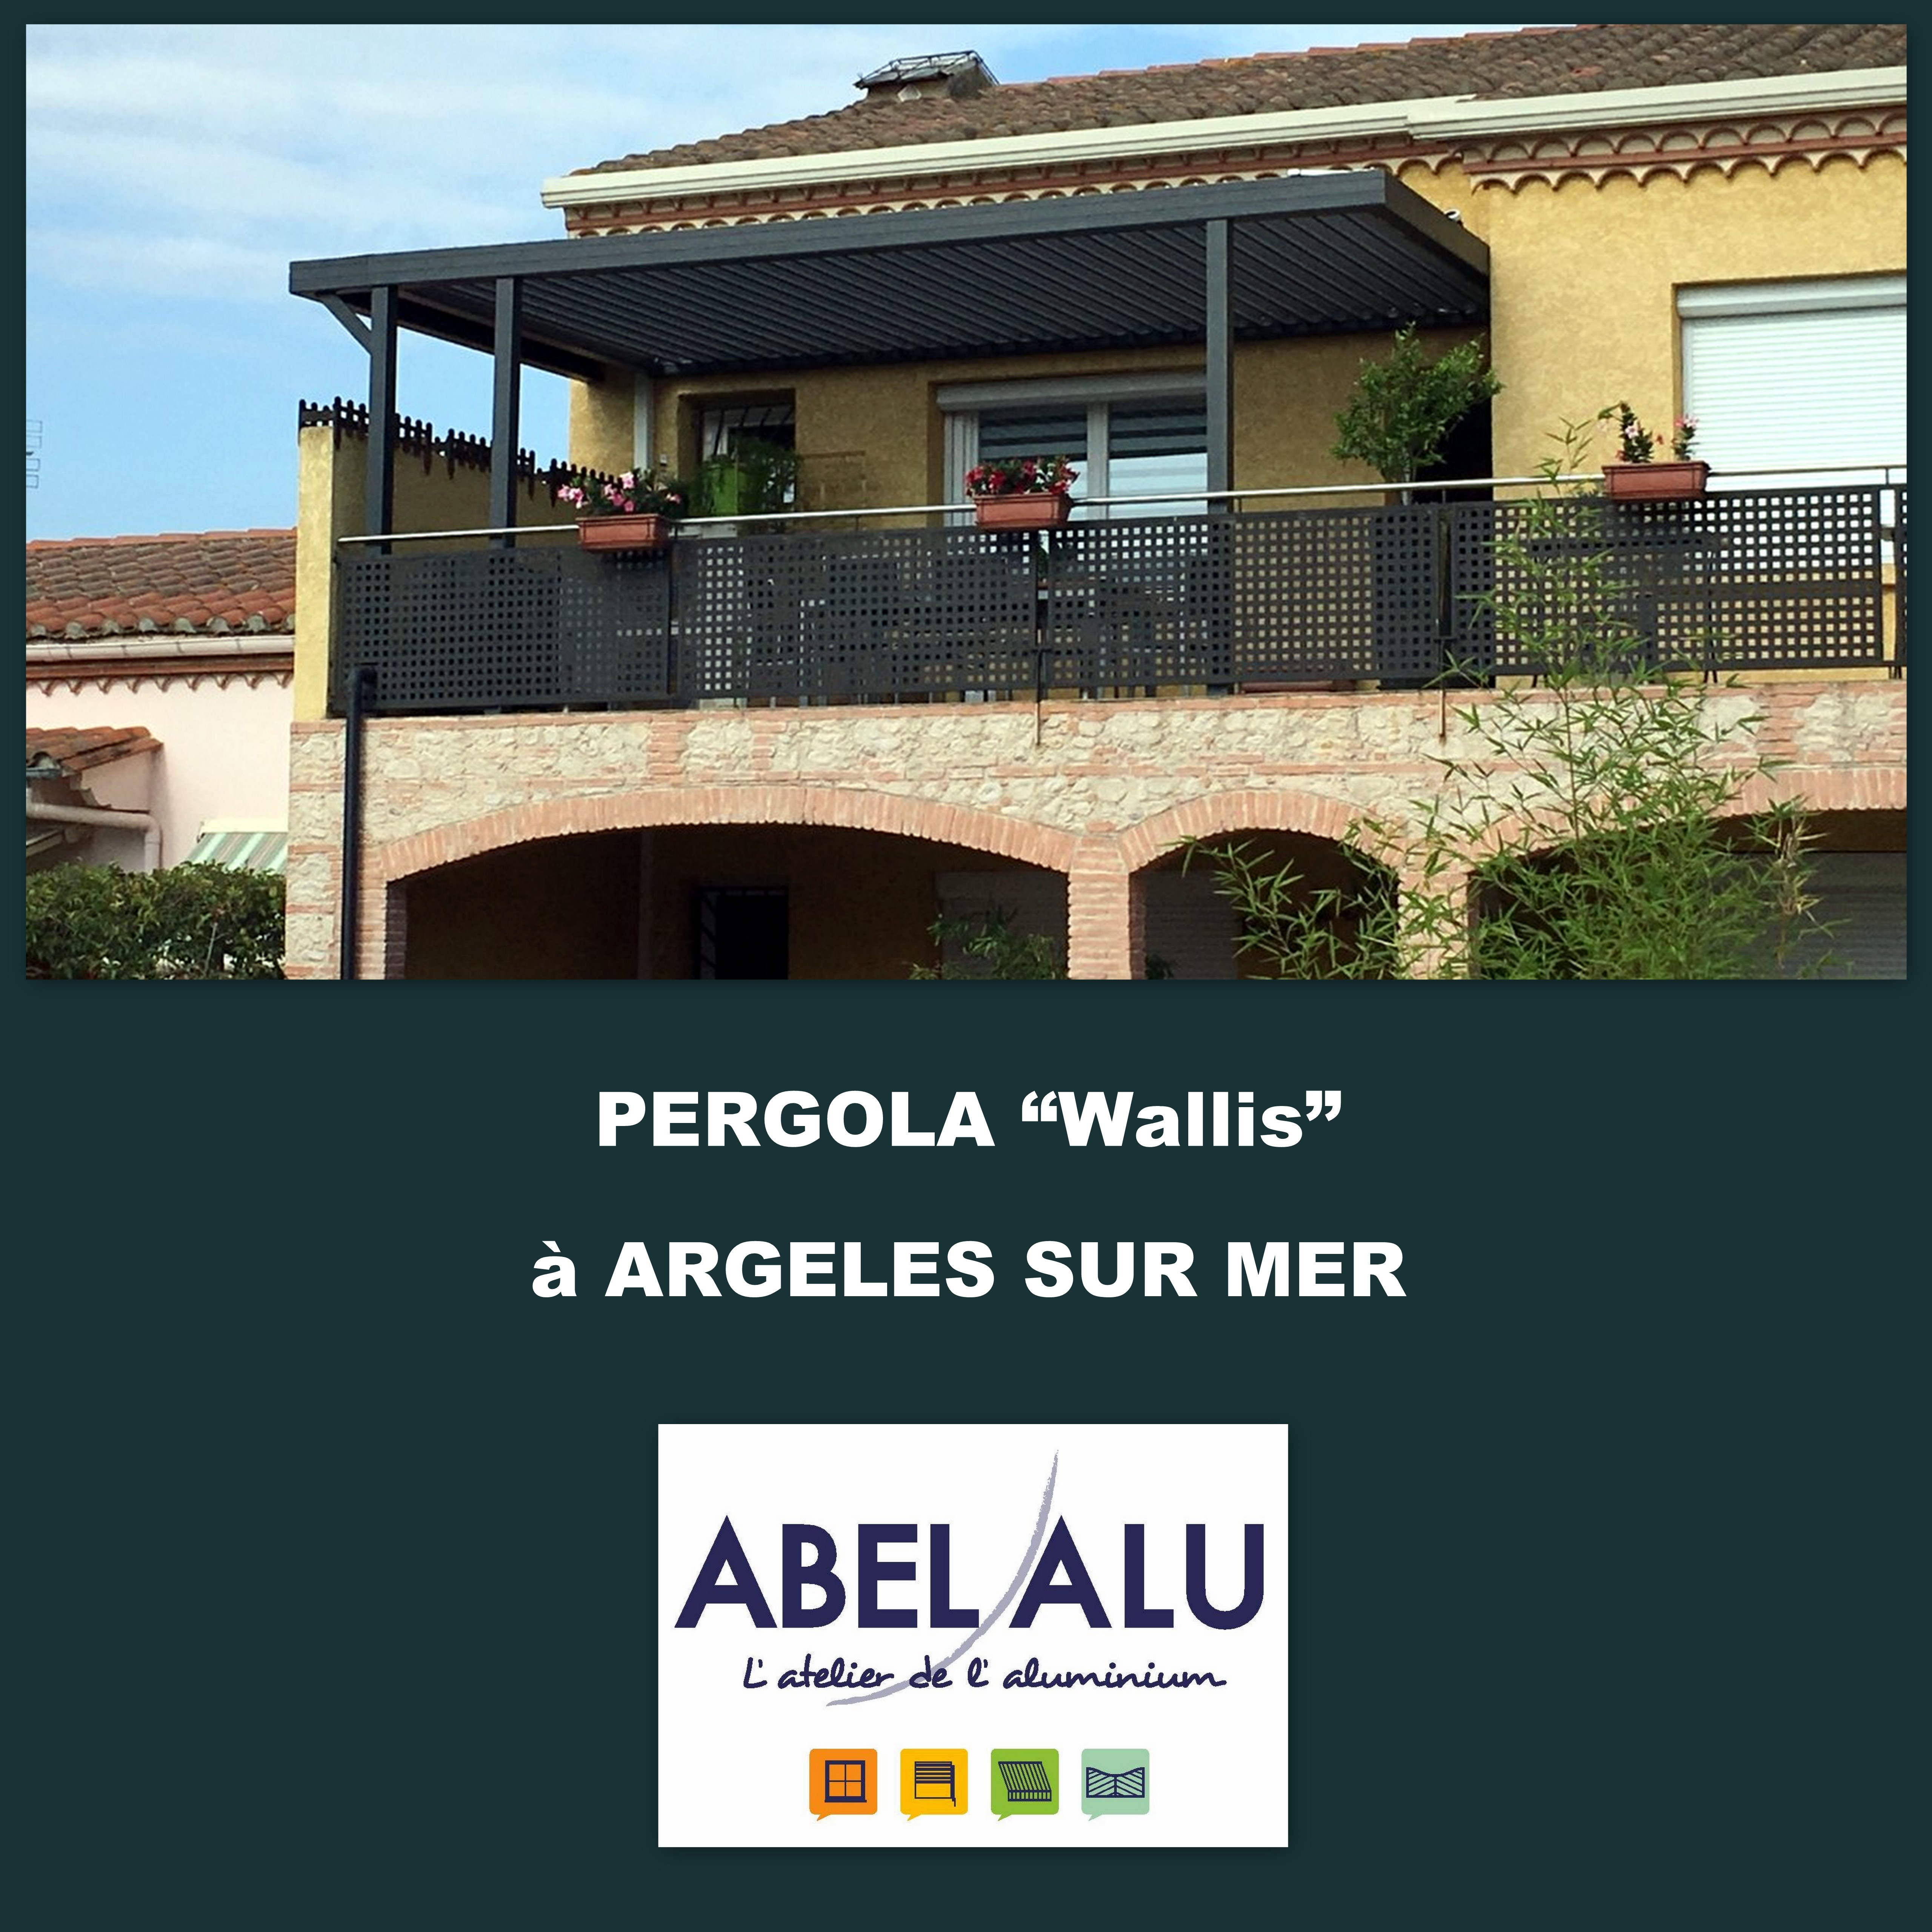 R alisation pergola wallis argeles sur mer abel alu for Garage ford argeles sur mer